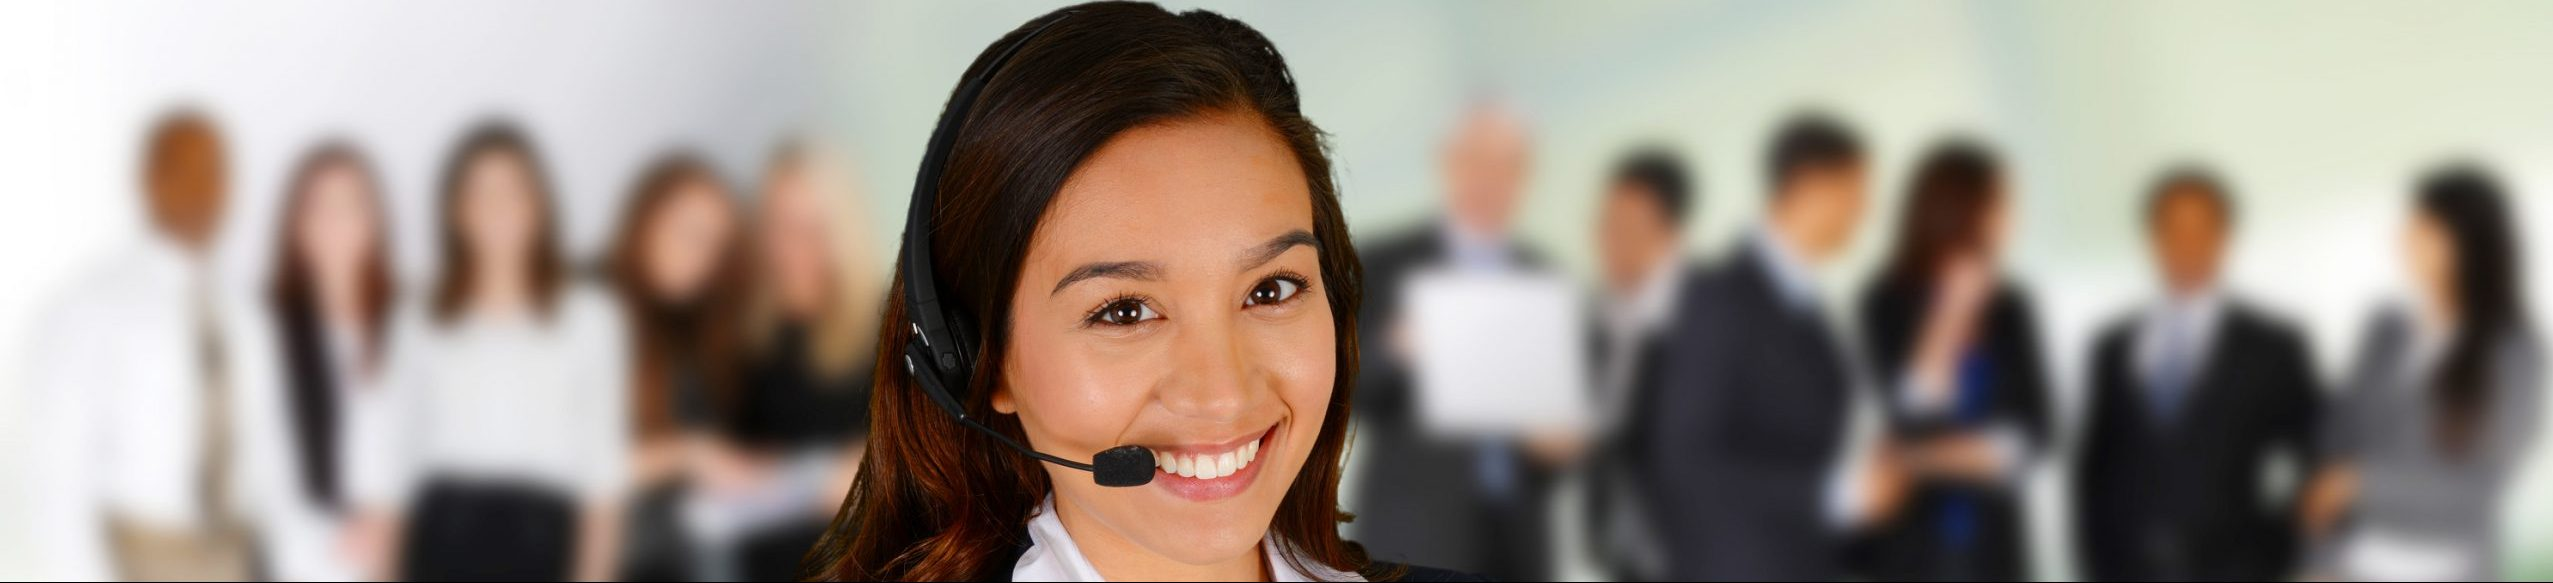 Telephone skills and etiquette training